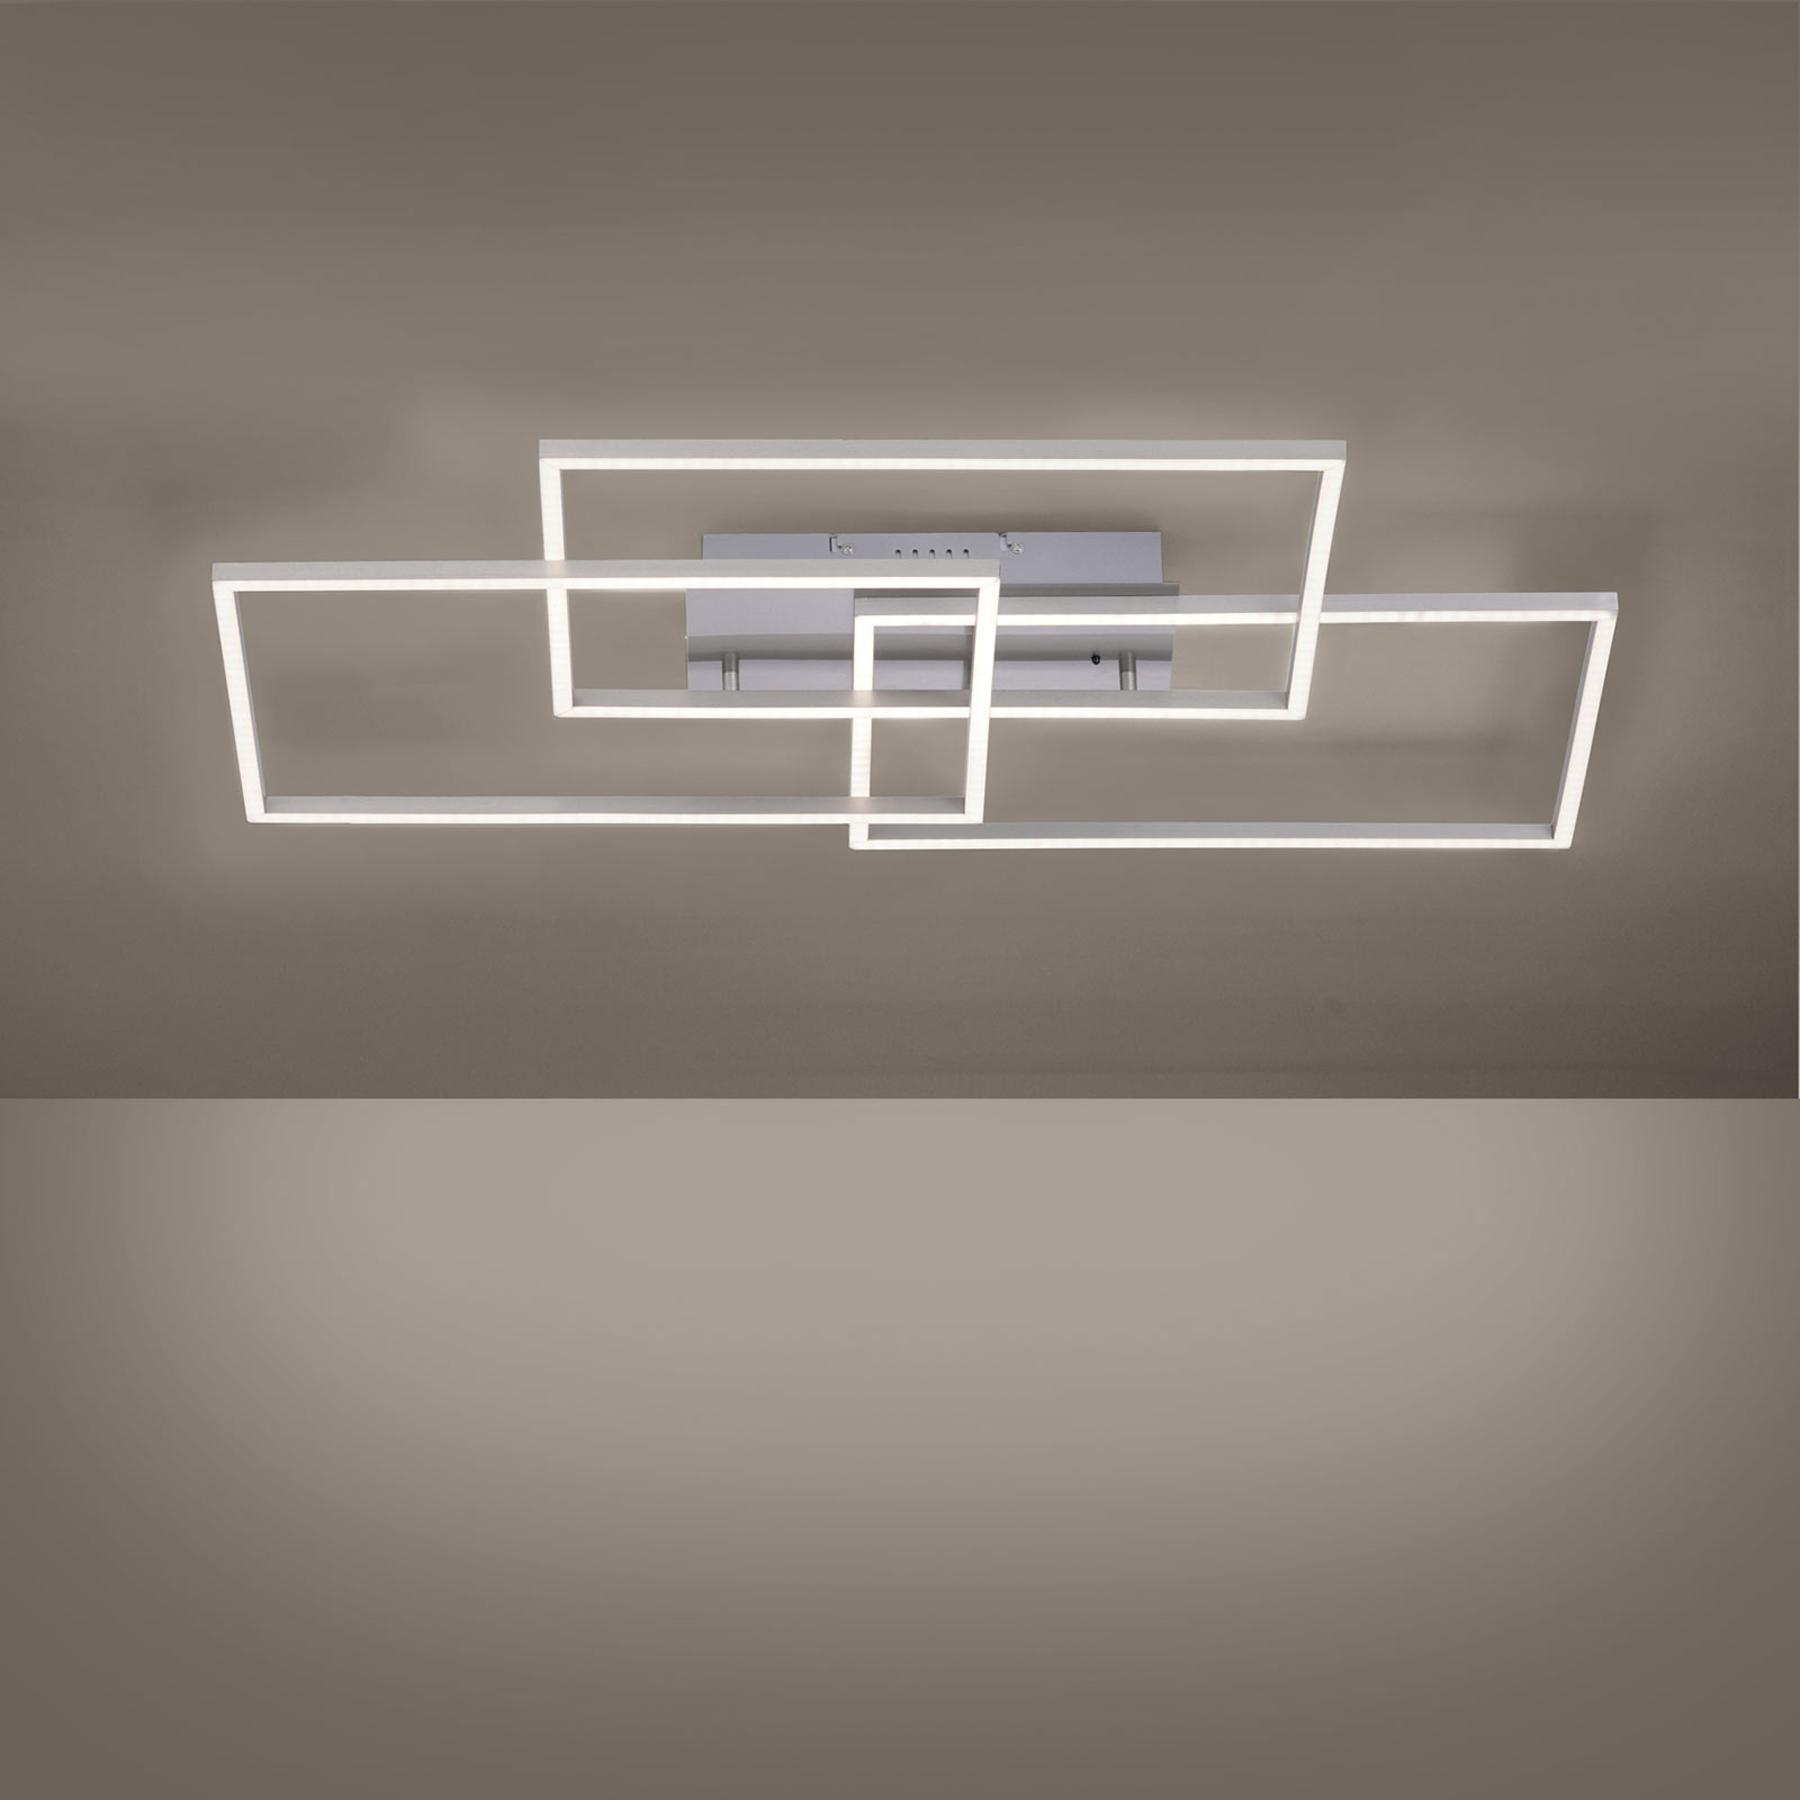 LED-Deckenleuchte Iven, stahl, 3-flammig, Rechteck